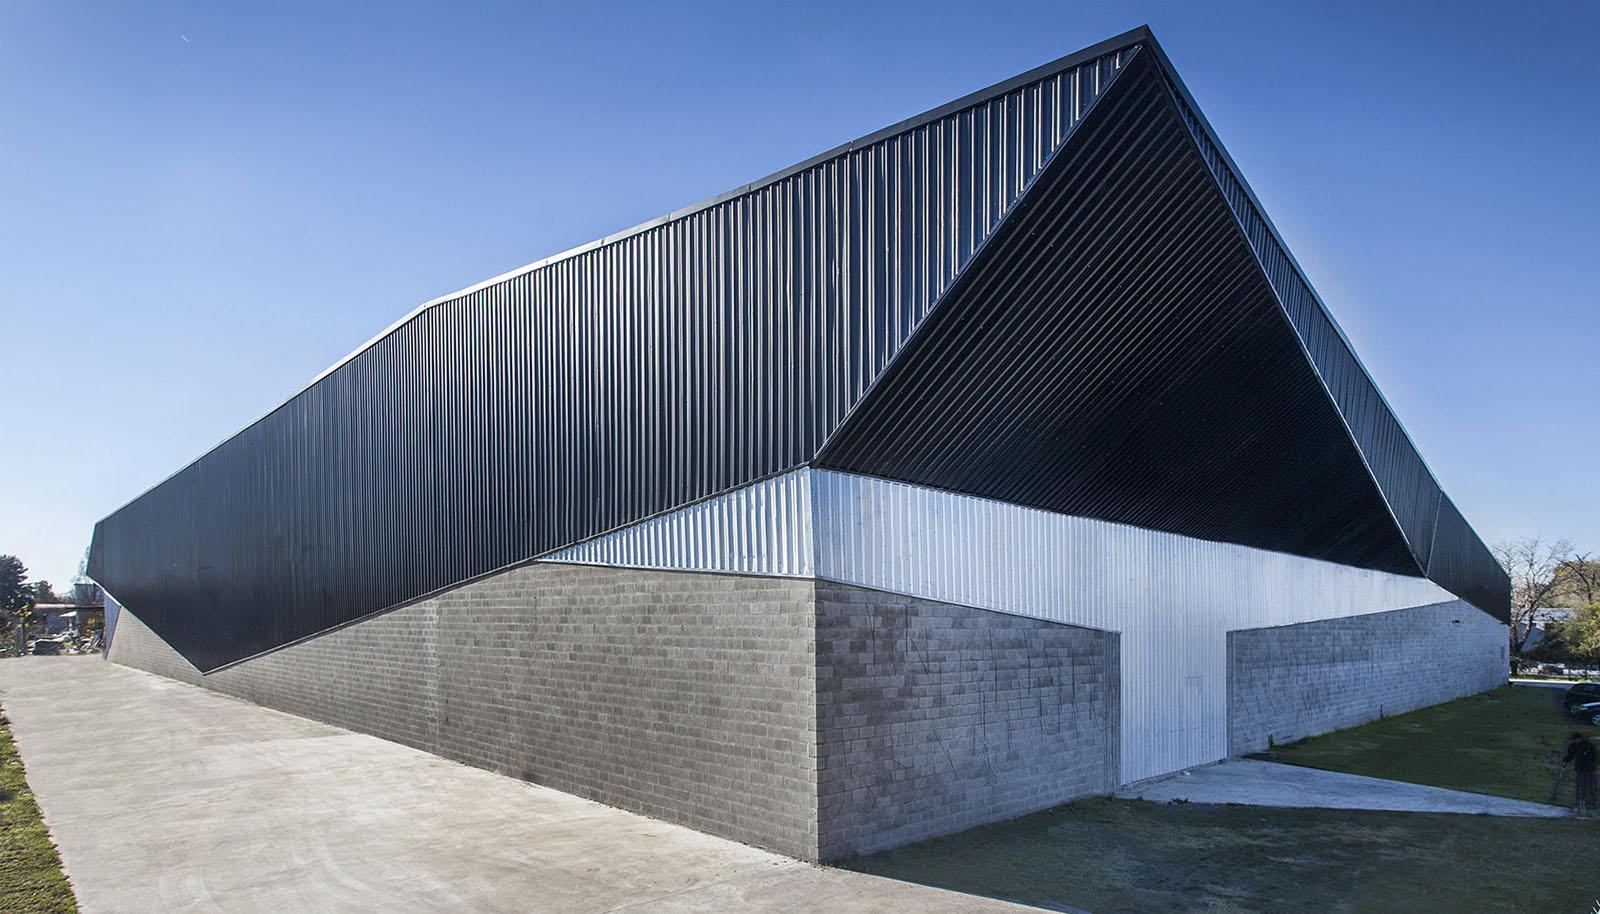 Foto frente fabrica, arquitectura contemporánea industrial, cubierta de chapa, plegado , fabrica contemporánea.